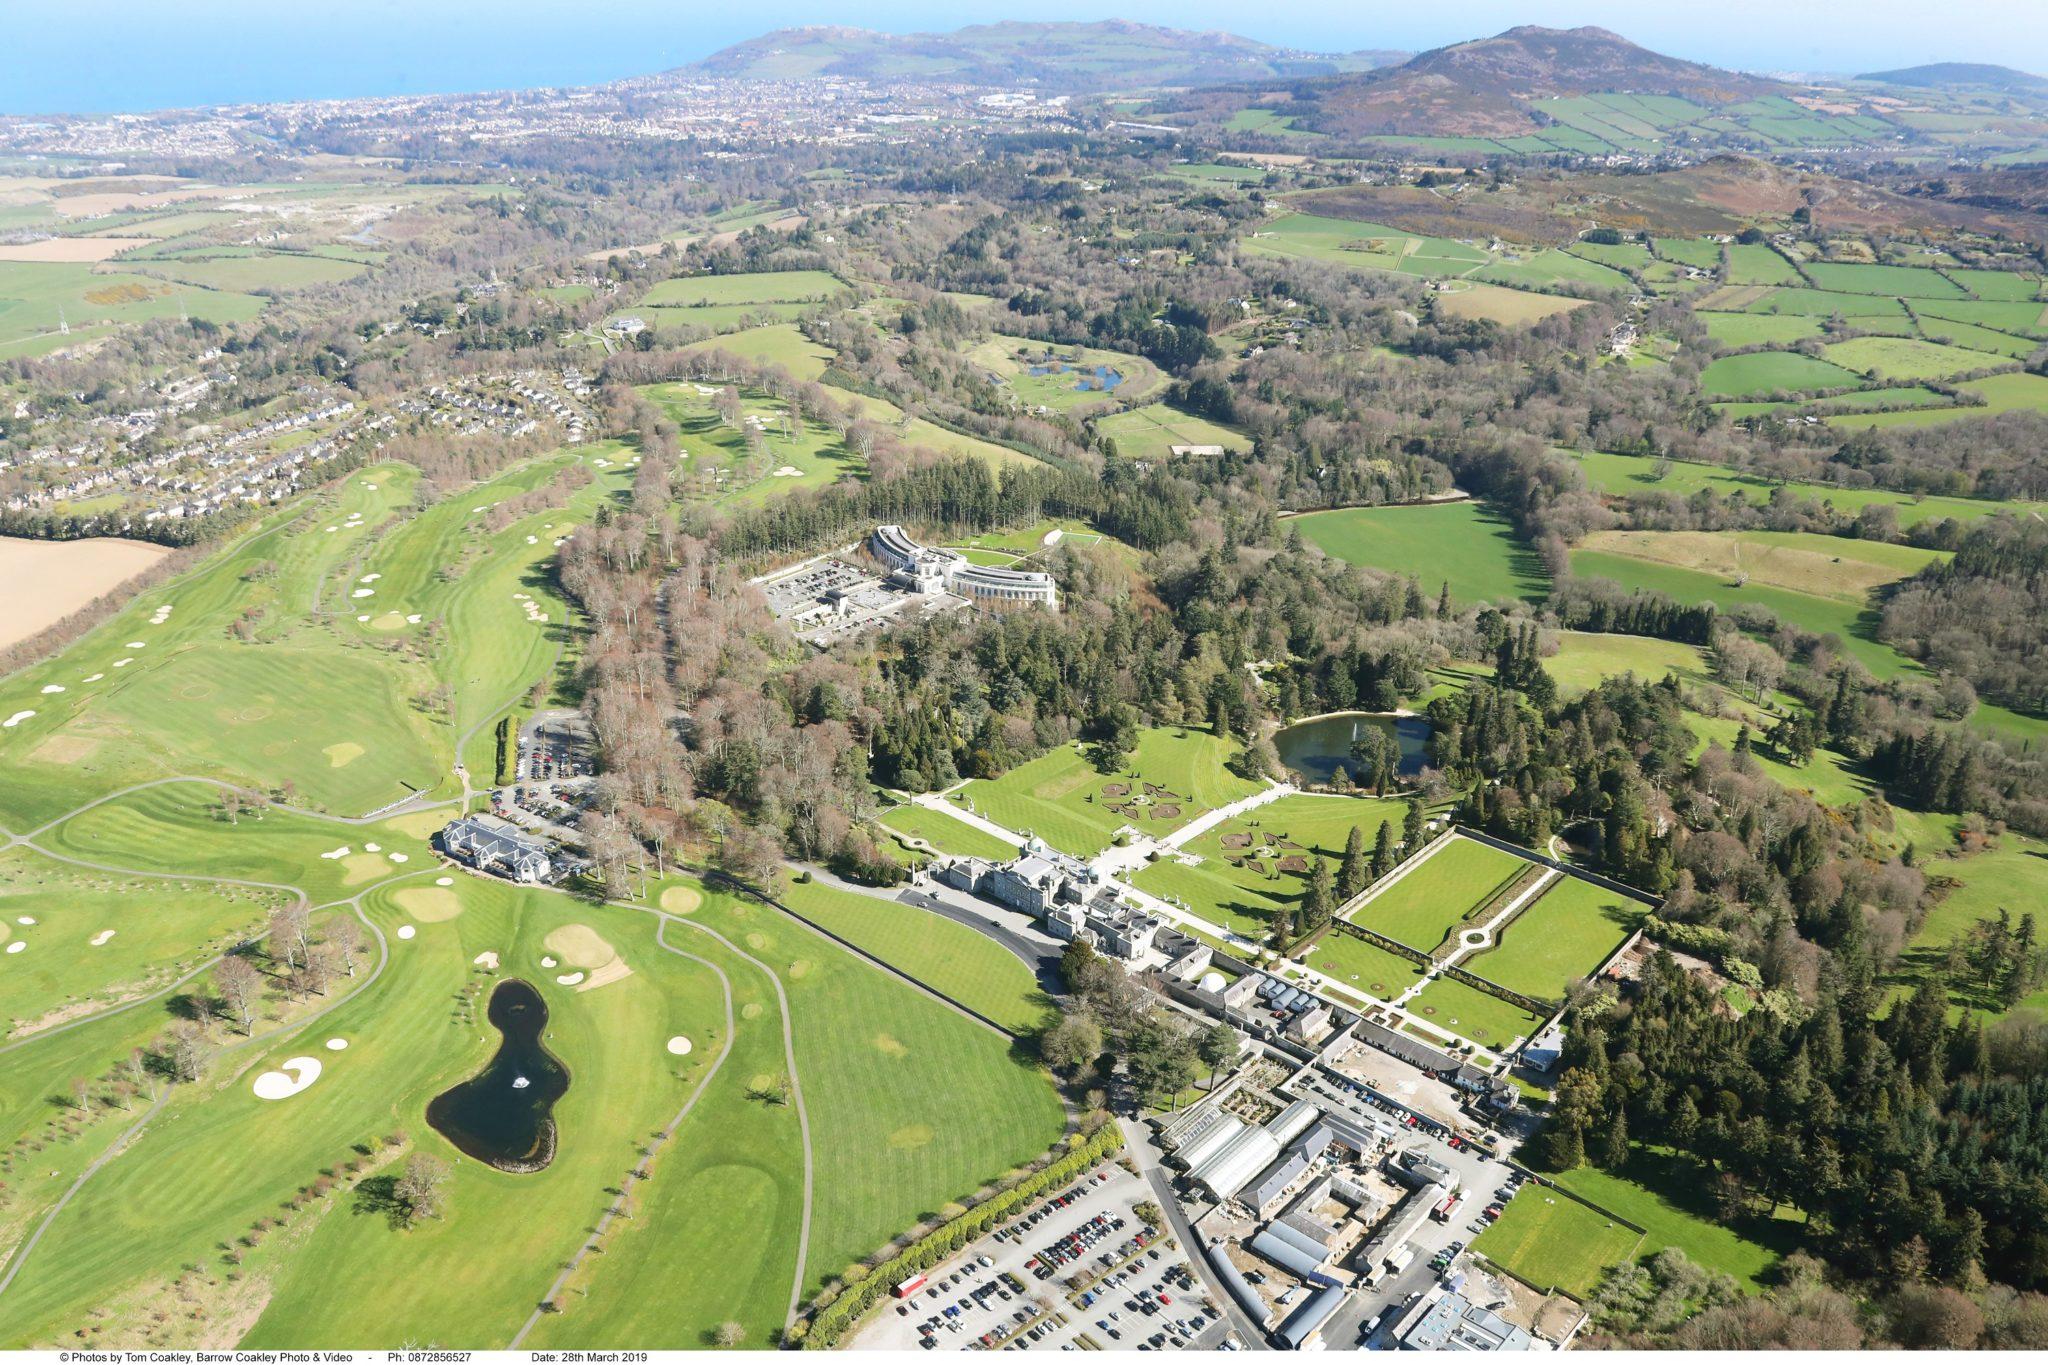 Powerscourt Estate from above